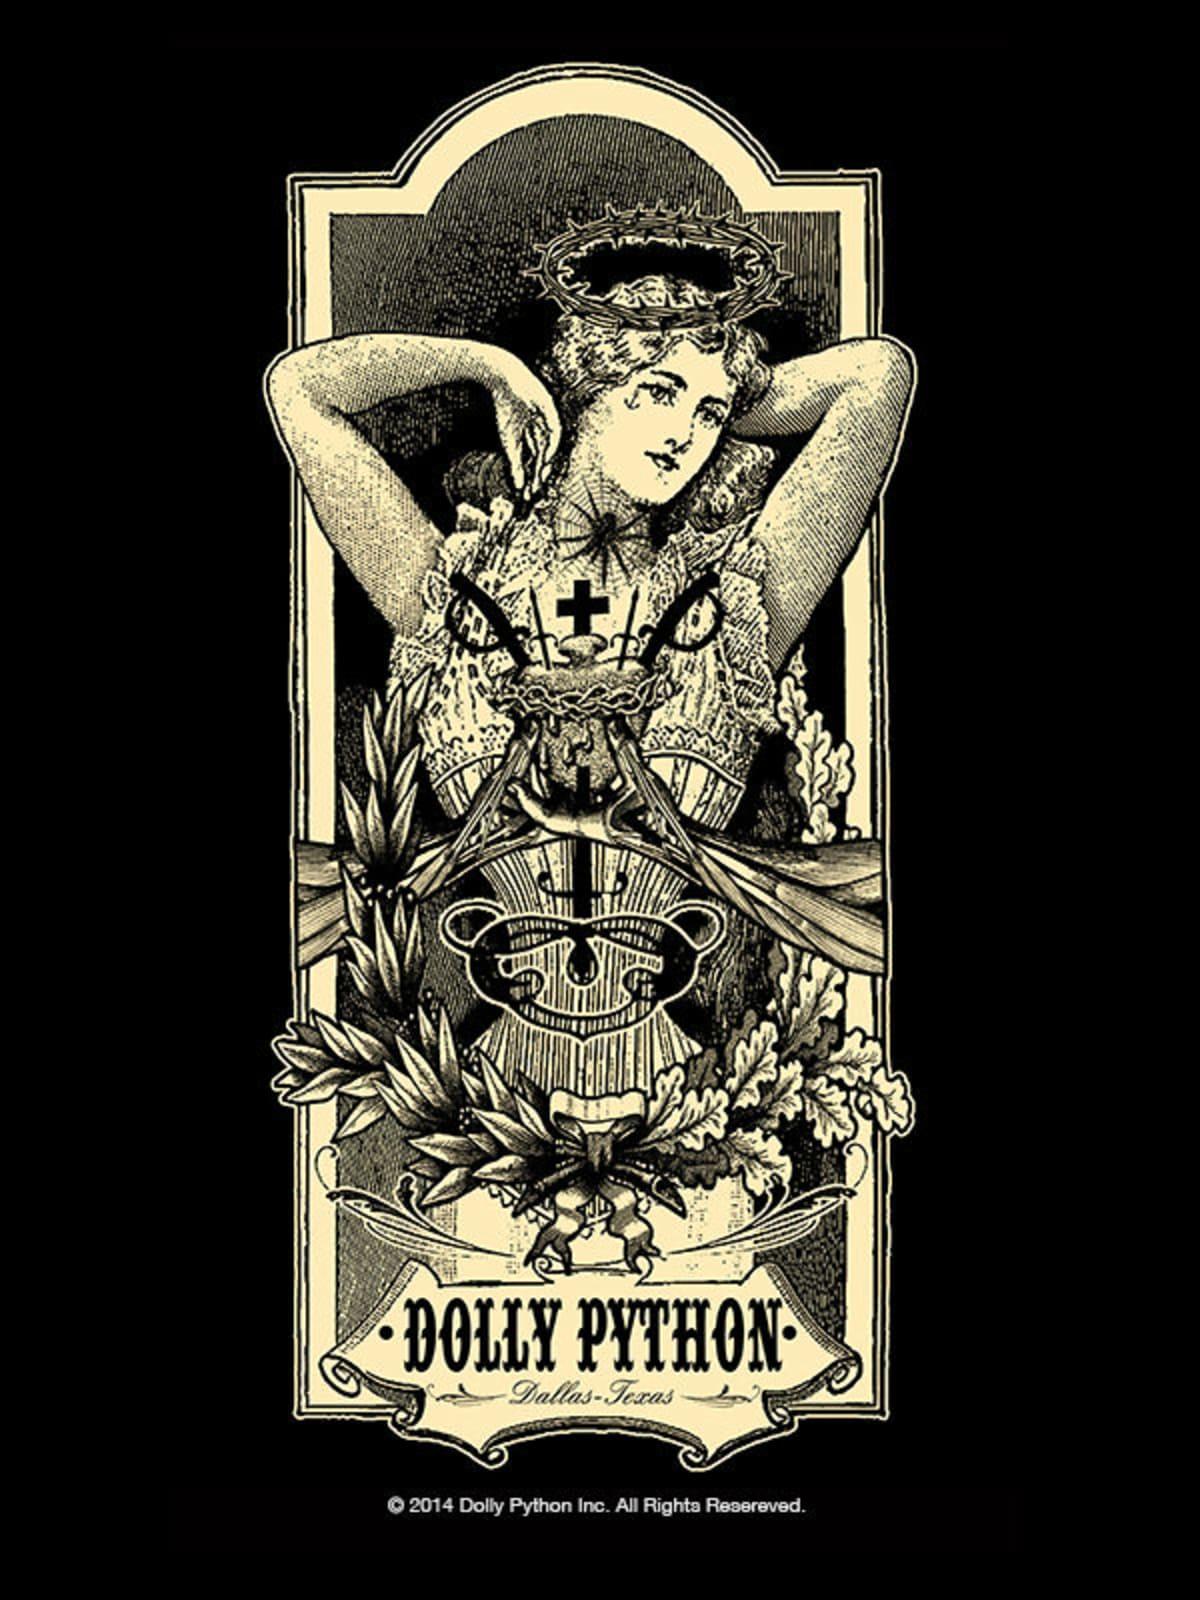 Ramon Maiden T-shirt at Dolly Python